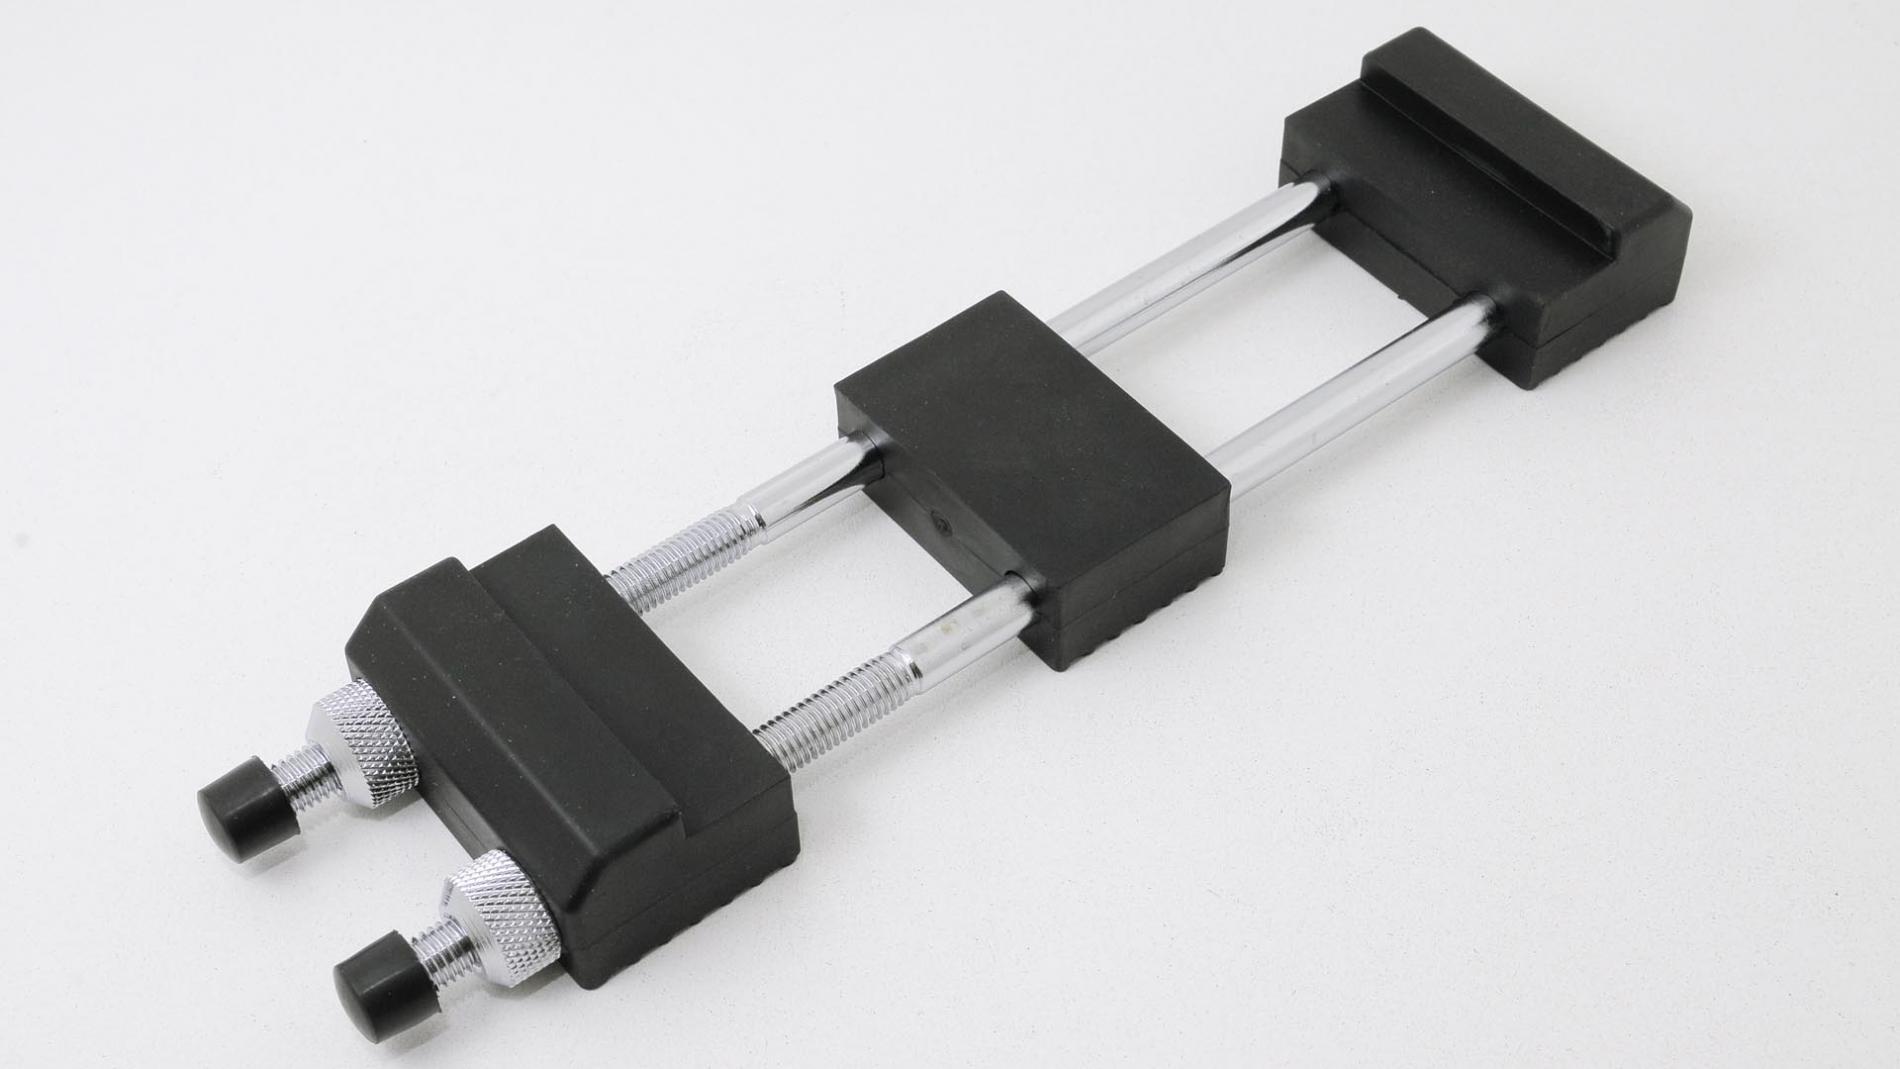 GUB0023-Base con 3 soportes para piedras de afilar con tuercas GUB0023-max-2.